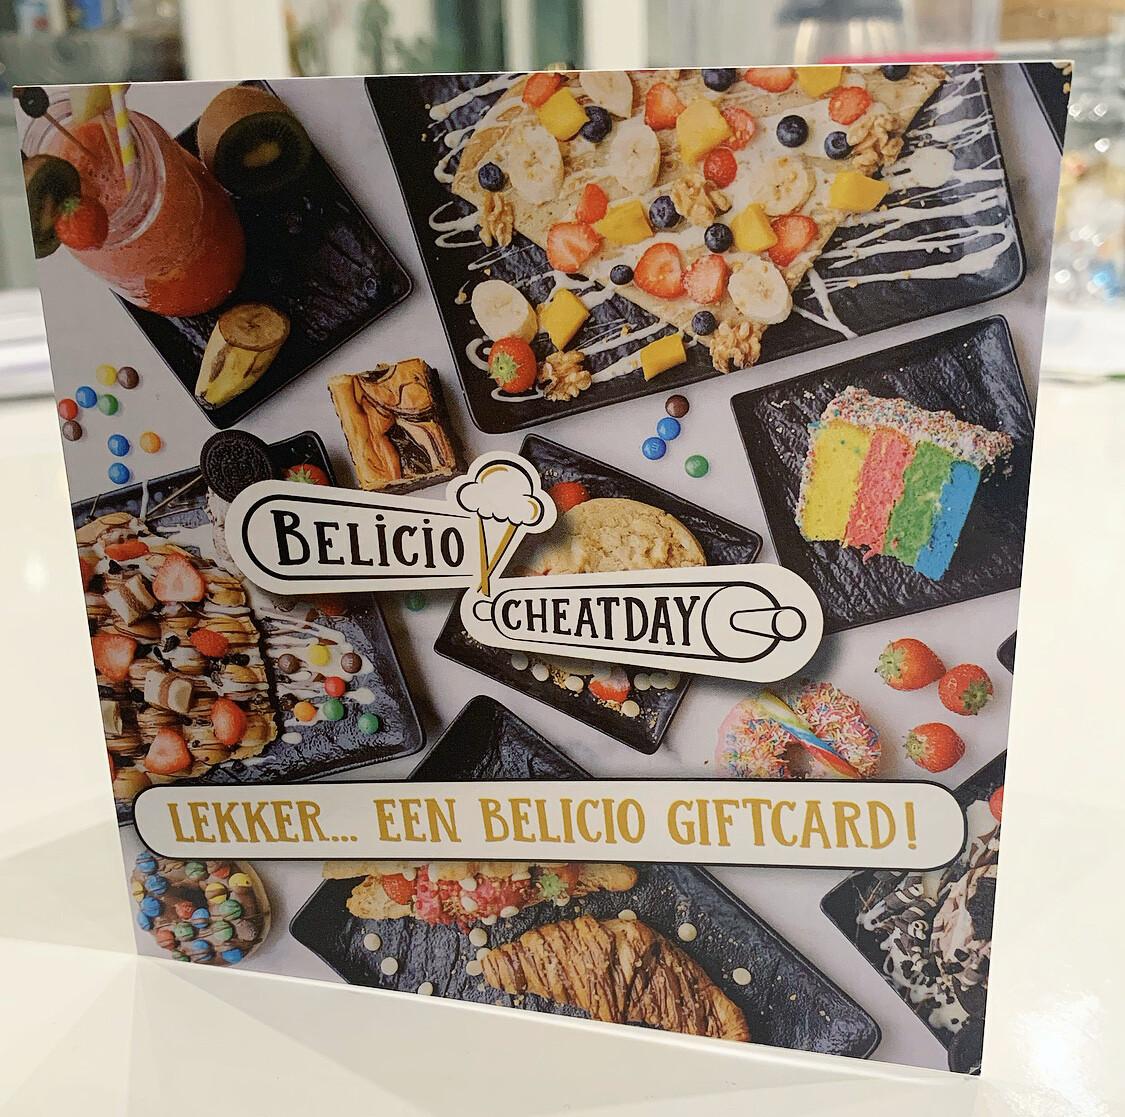 Giftcard Voor Cheatday Stores Twv. €15,-